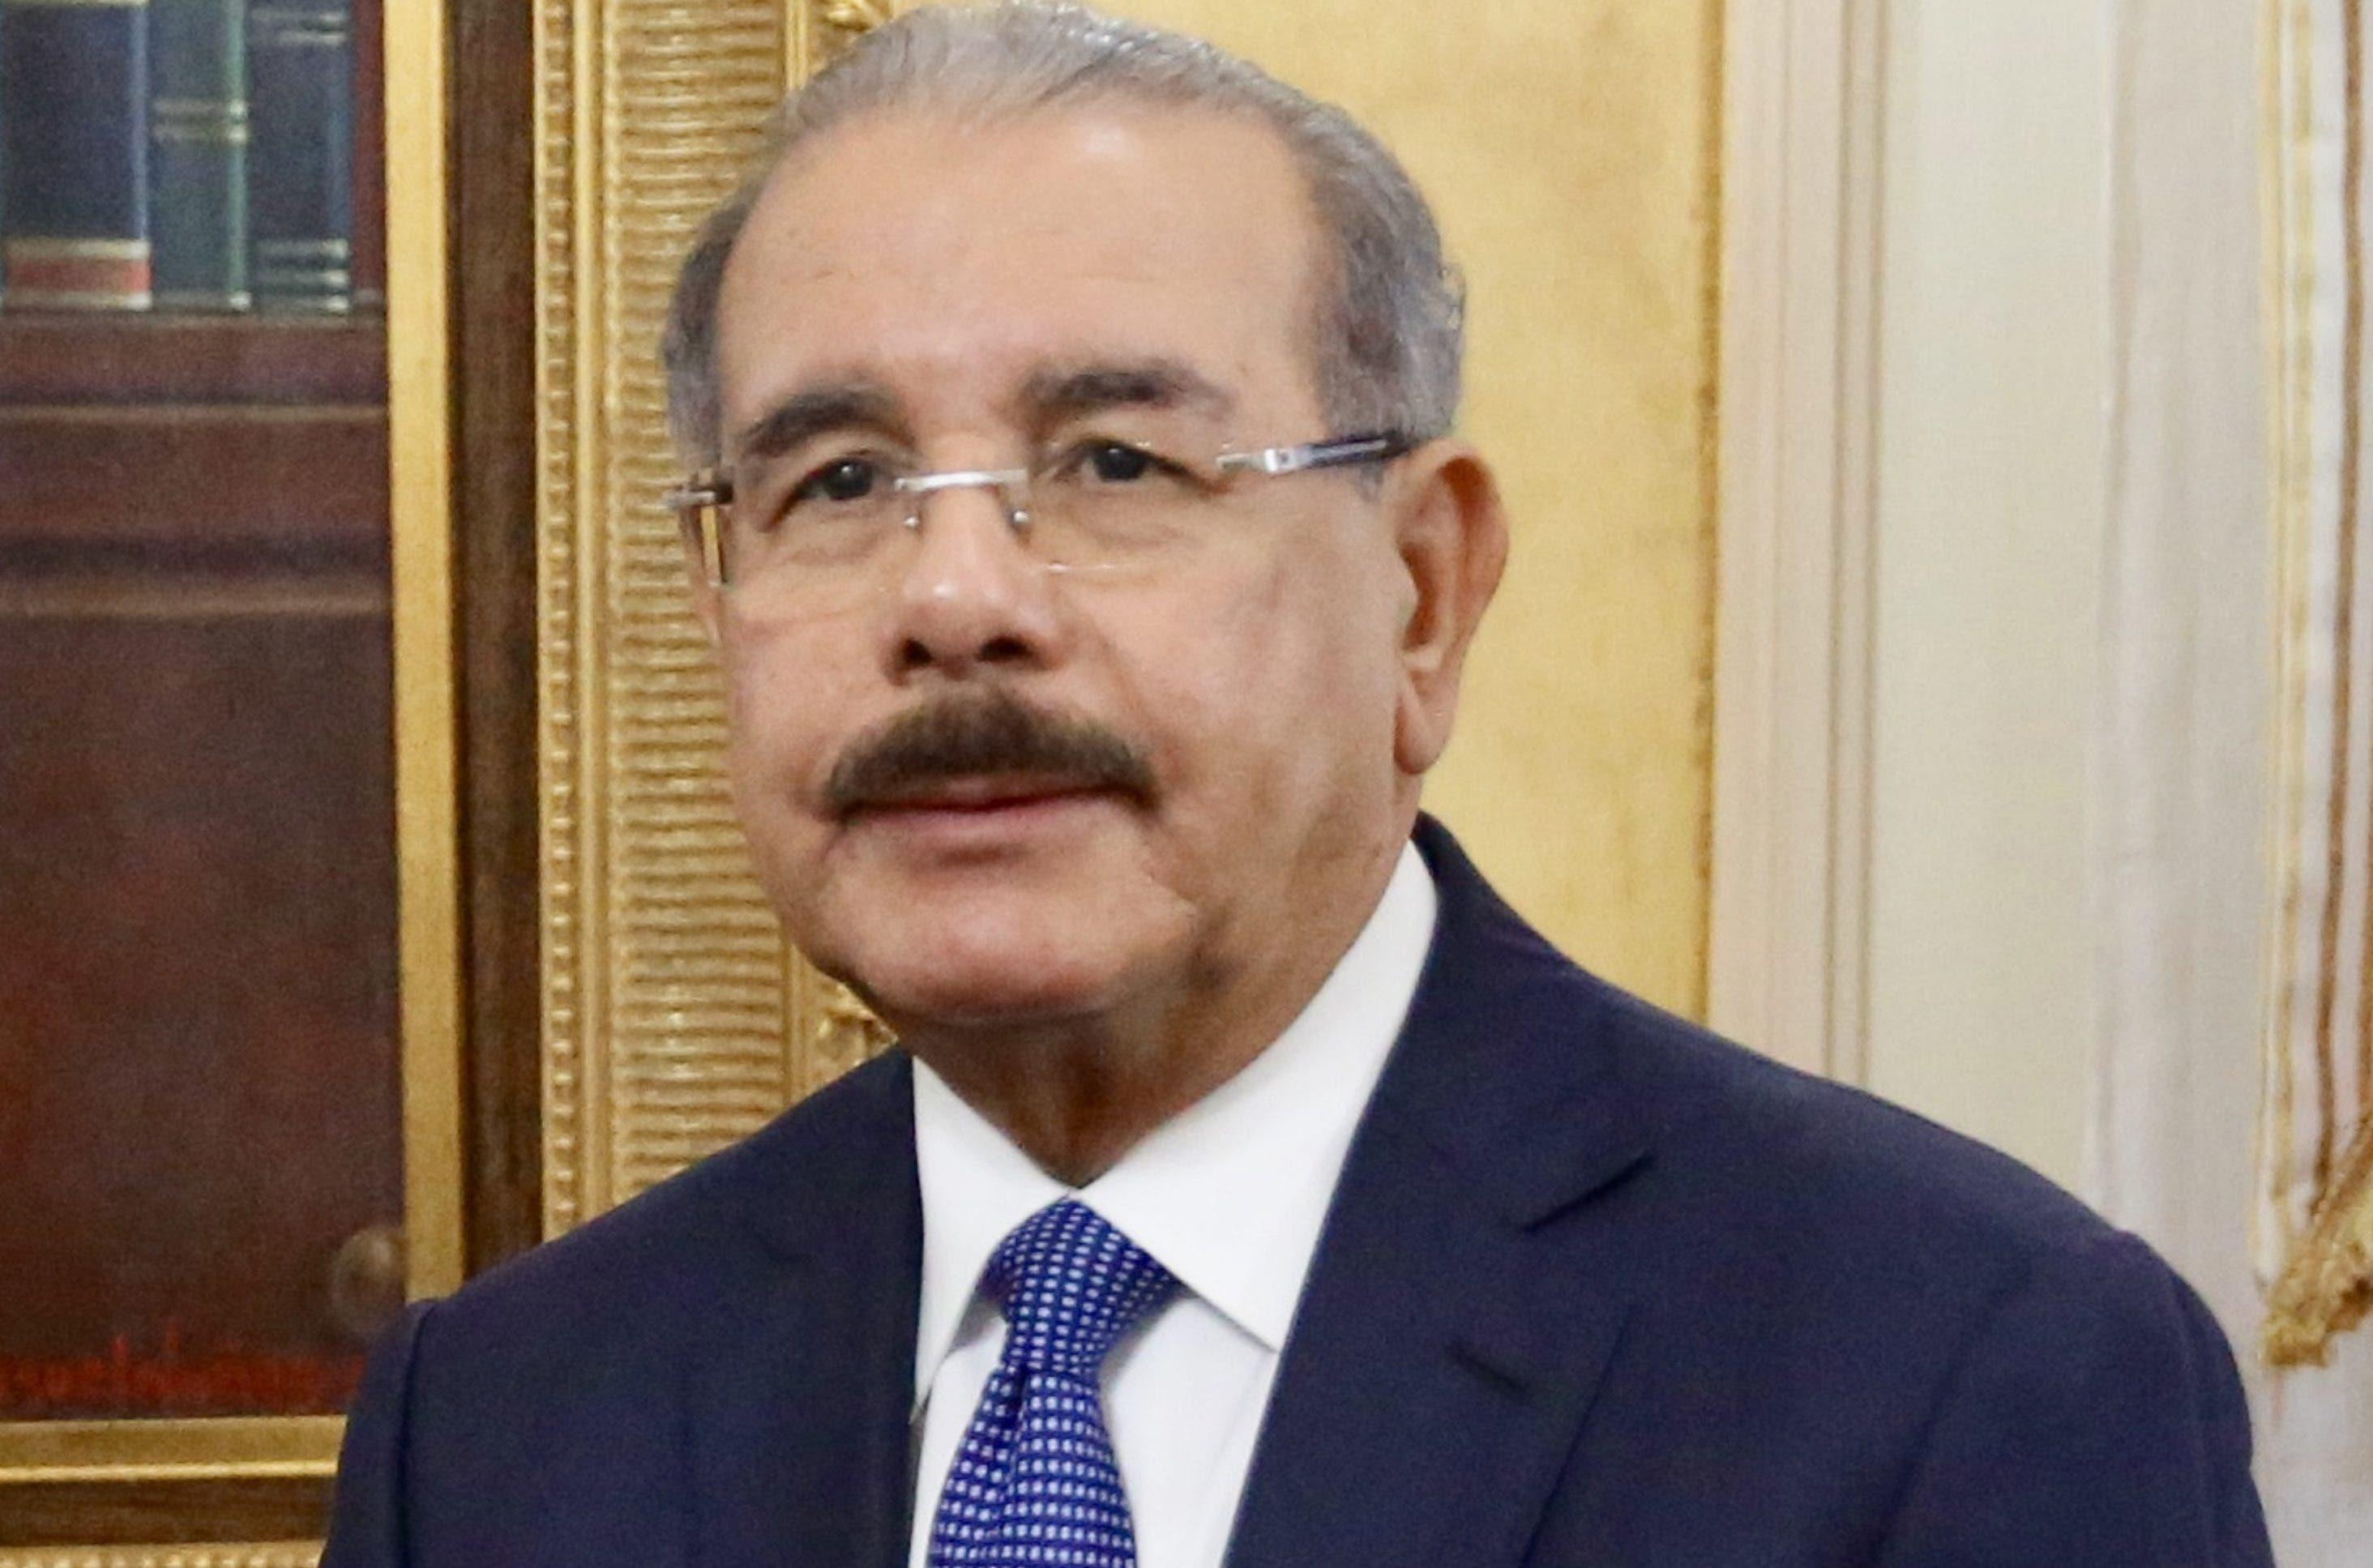 Presidente Danilo Medina votará este domingo en horas de la tarde